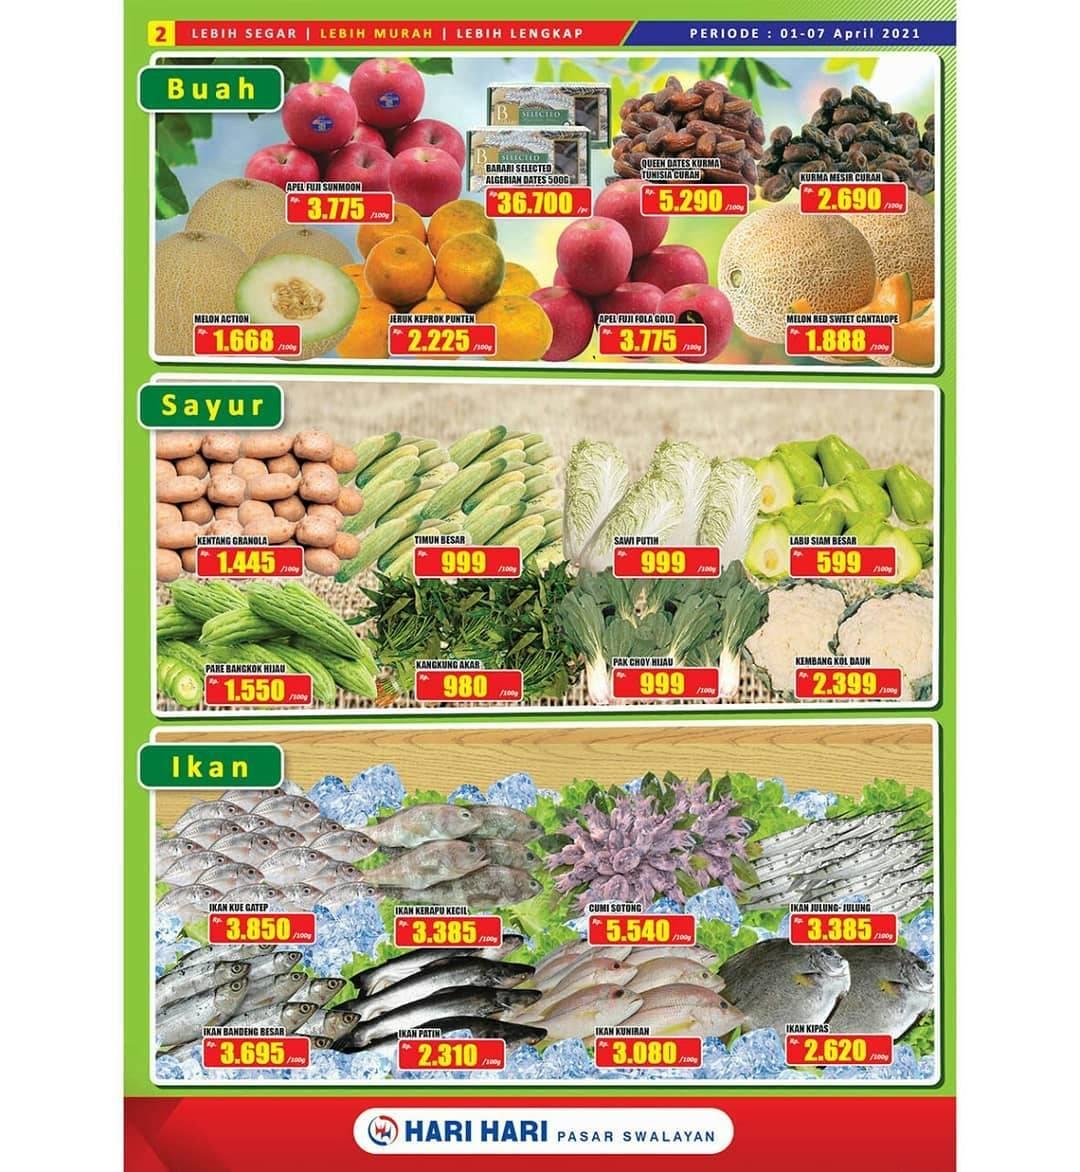 Promo diskon Katalog Promo Hari Hari Swalayan Promo PAS Periode 1 - 14 April 2021